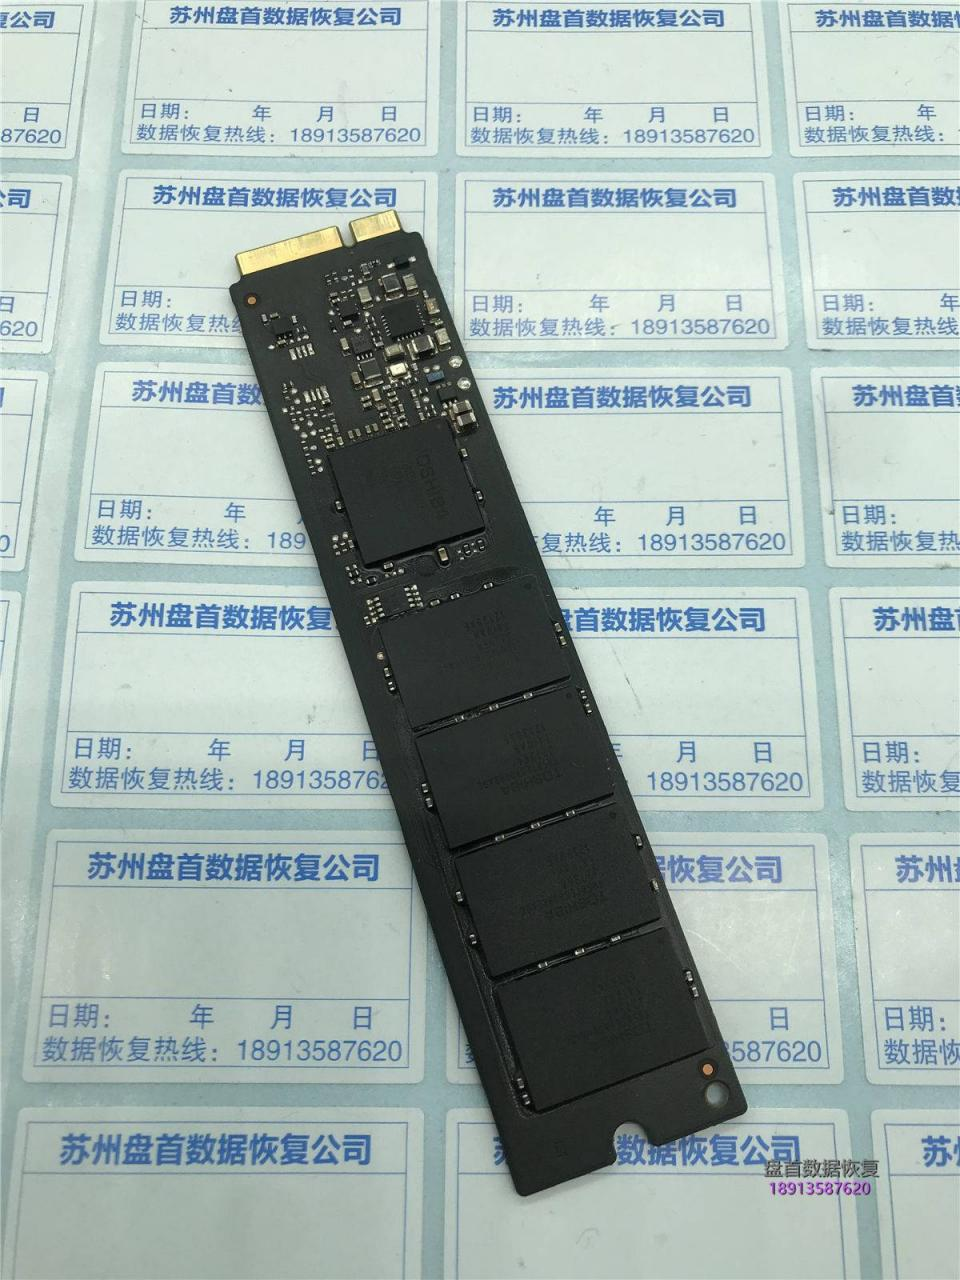 MacBook air固态硬盘损坏数据恢复成功主控TC58NC5HJ8GSB东芝SSD